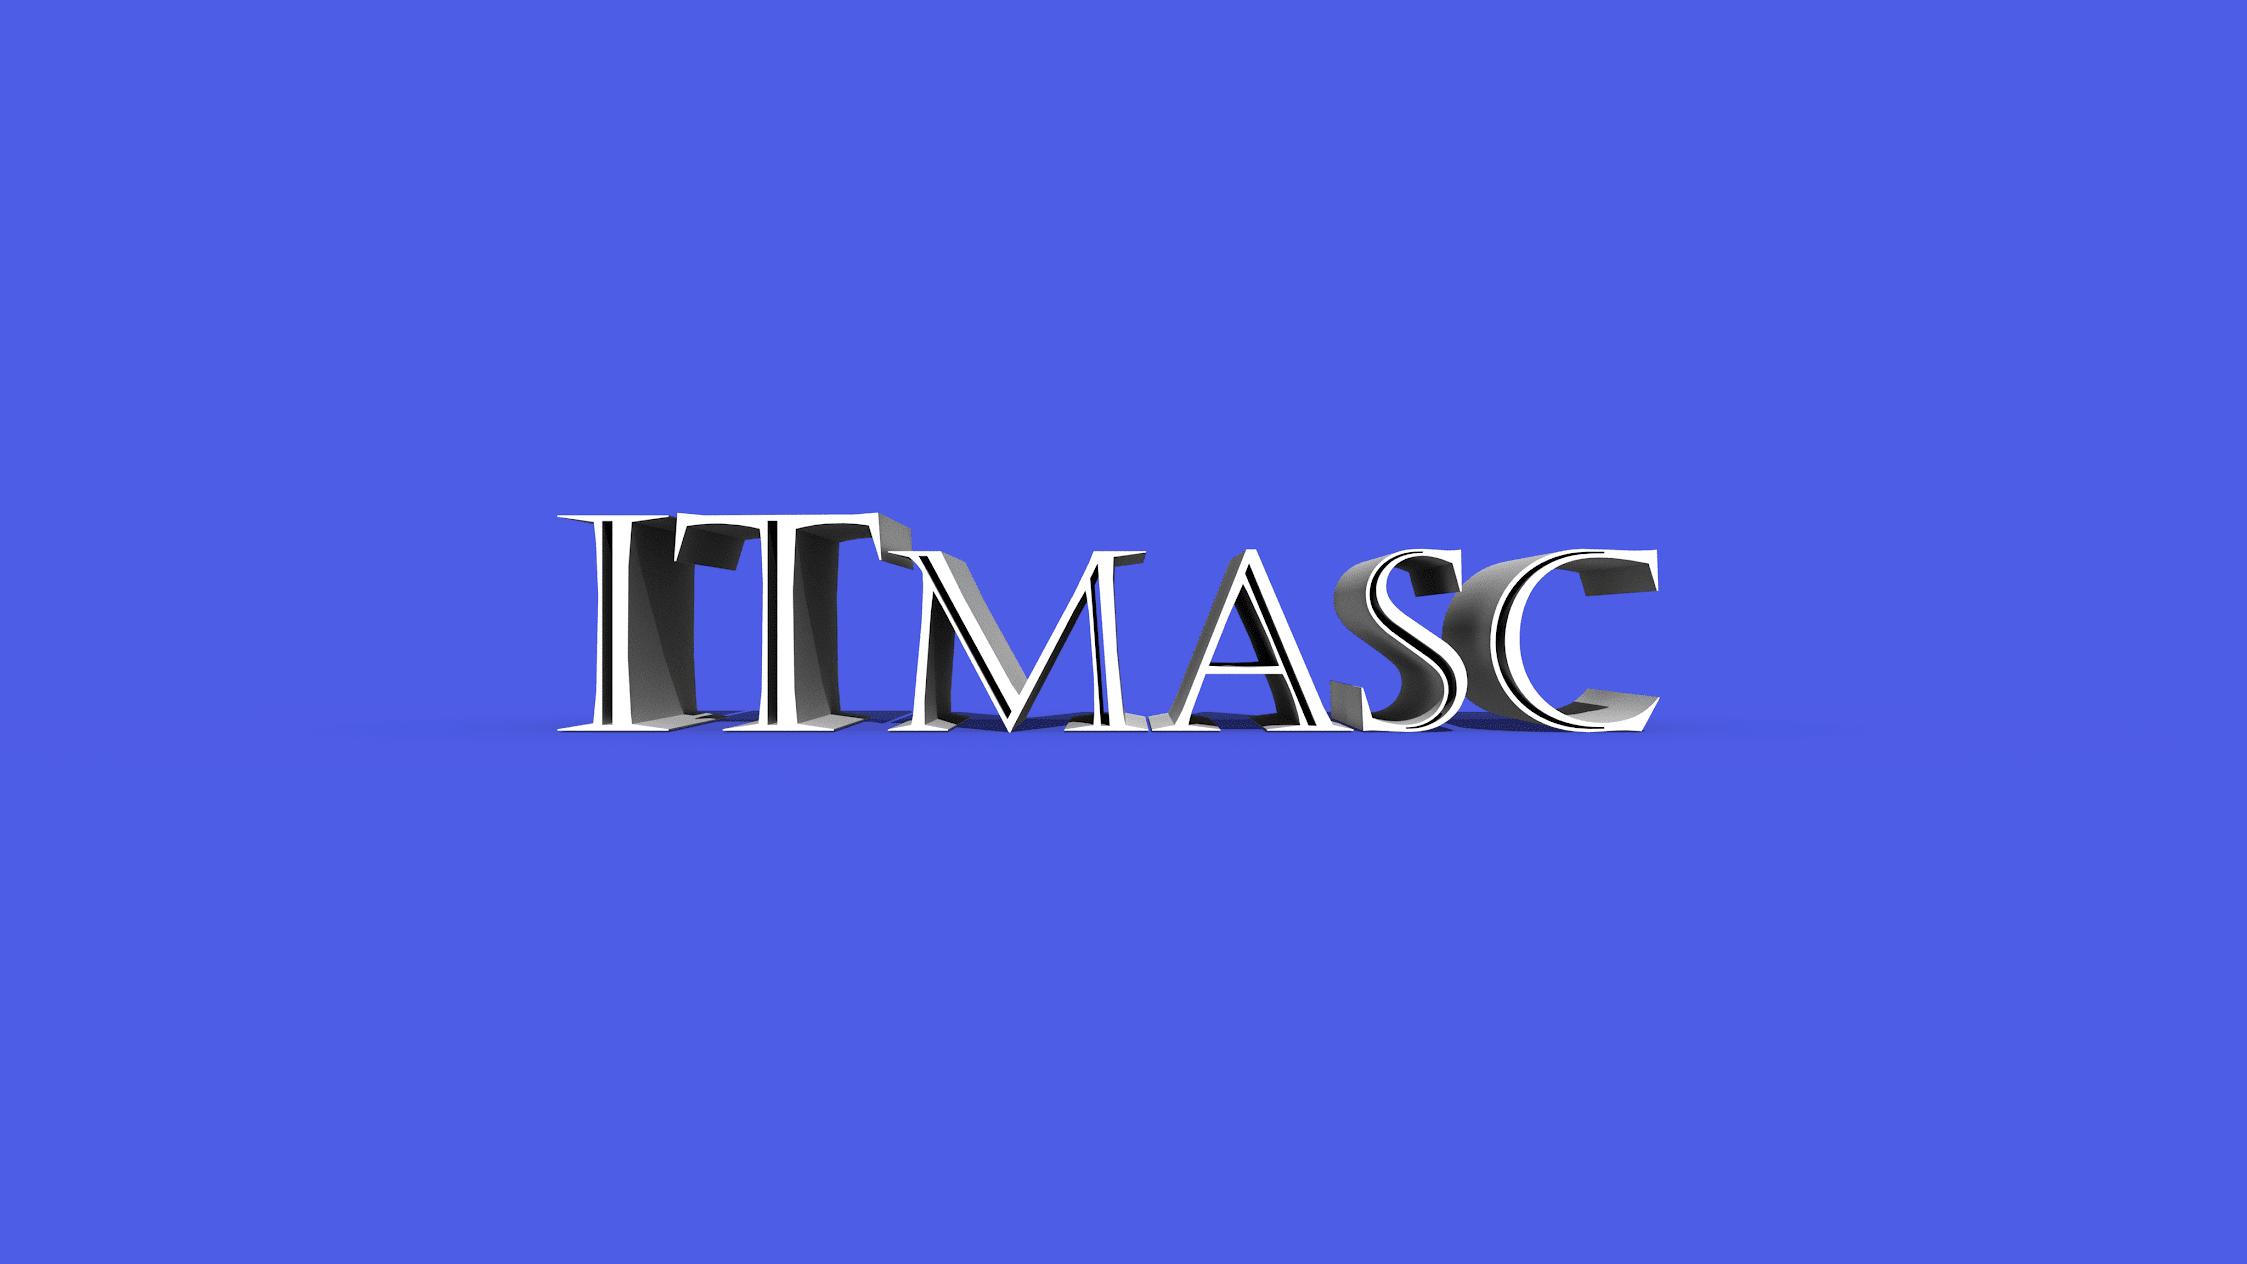 ITmasc